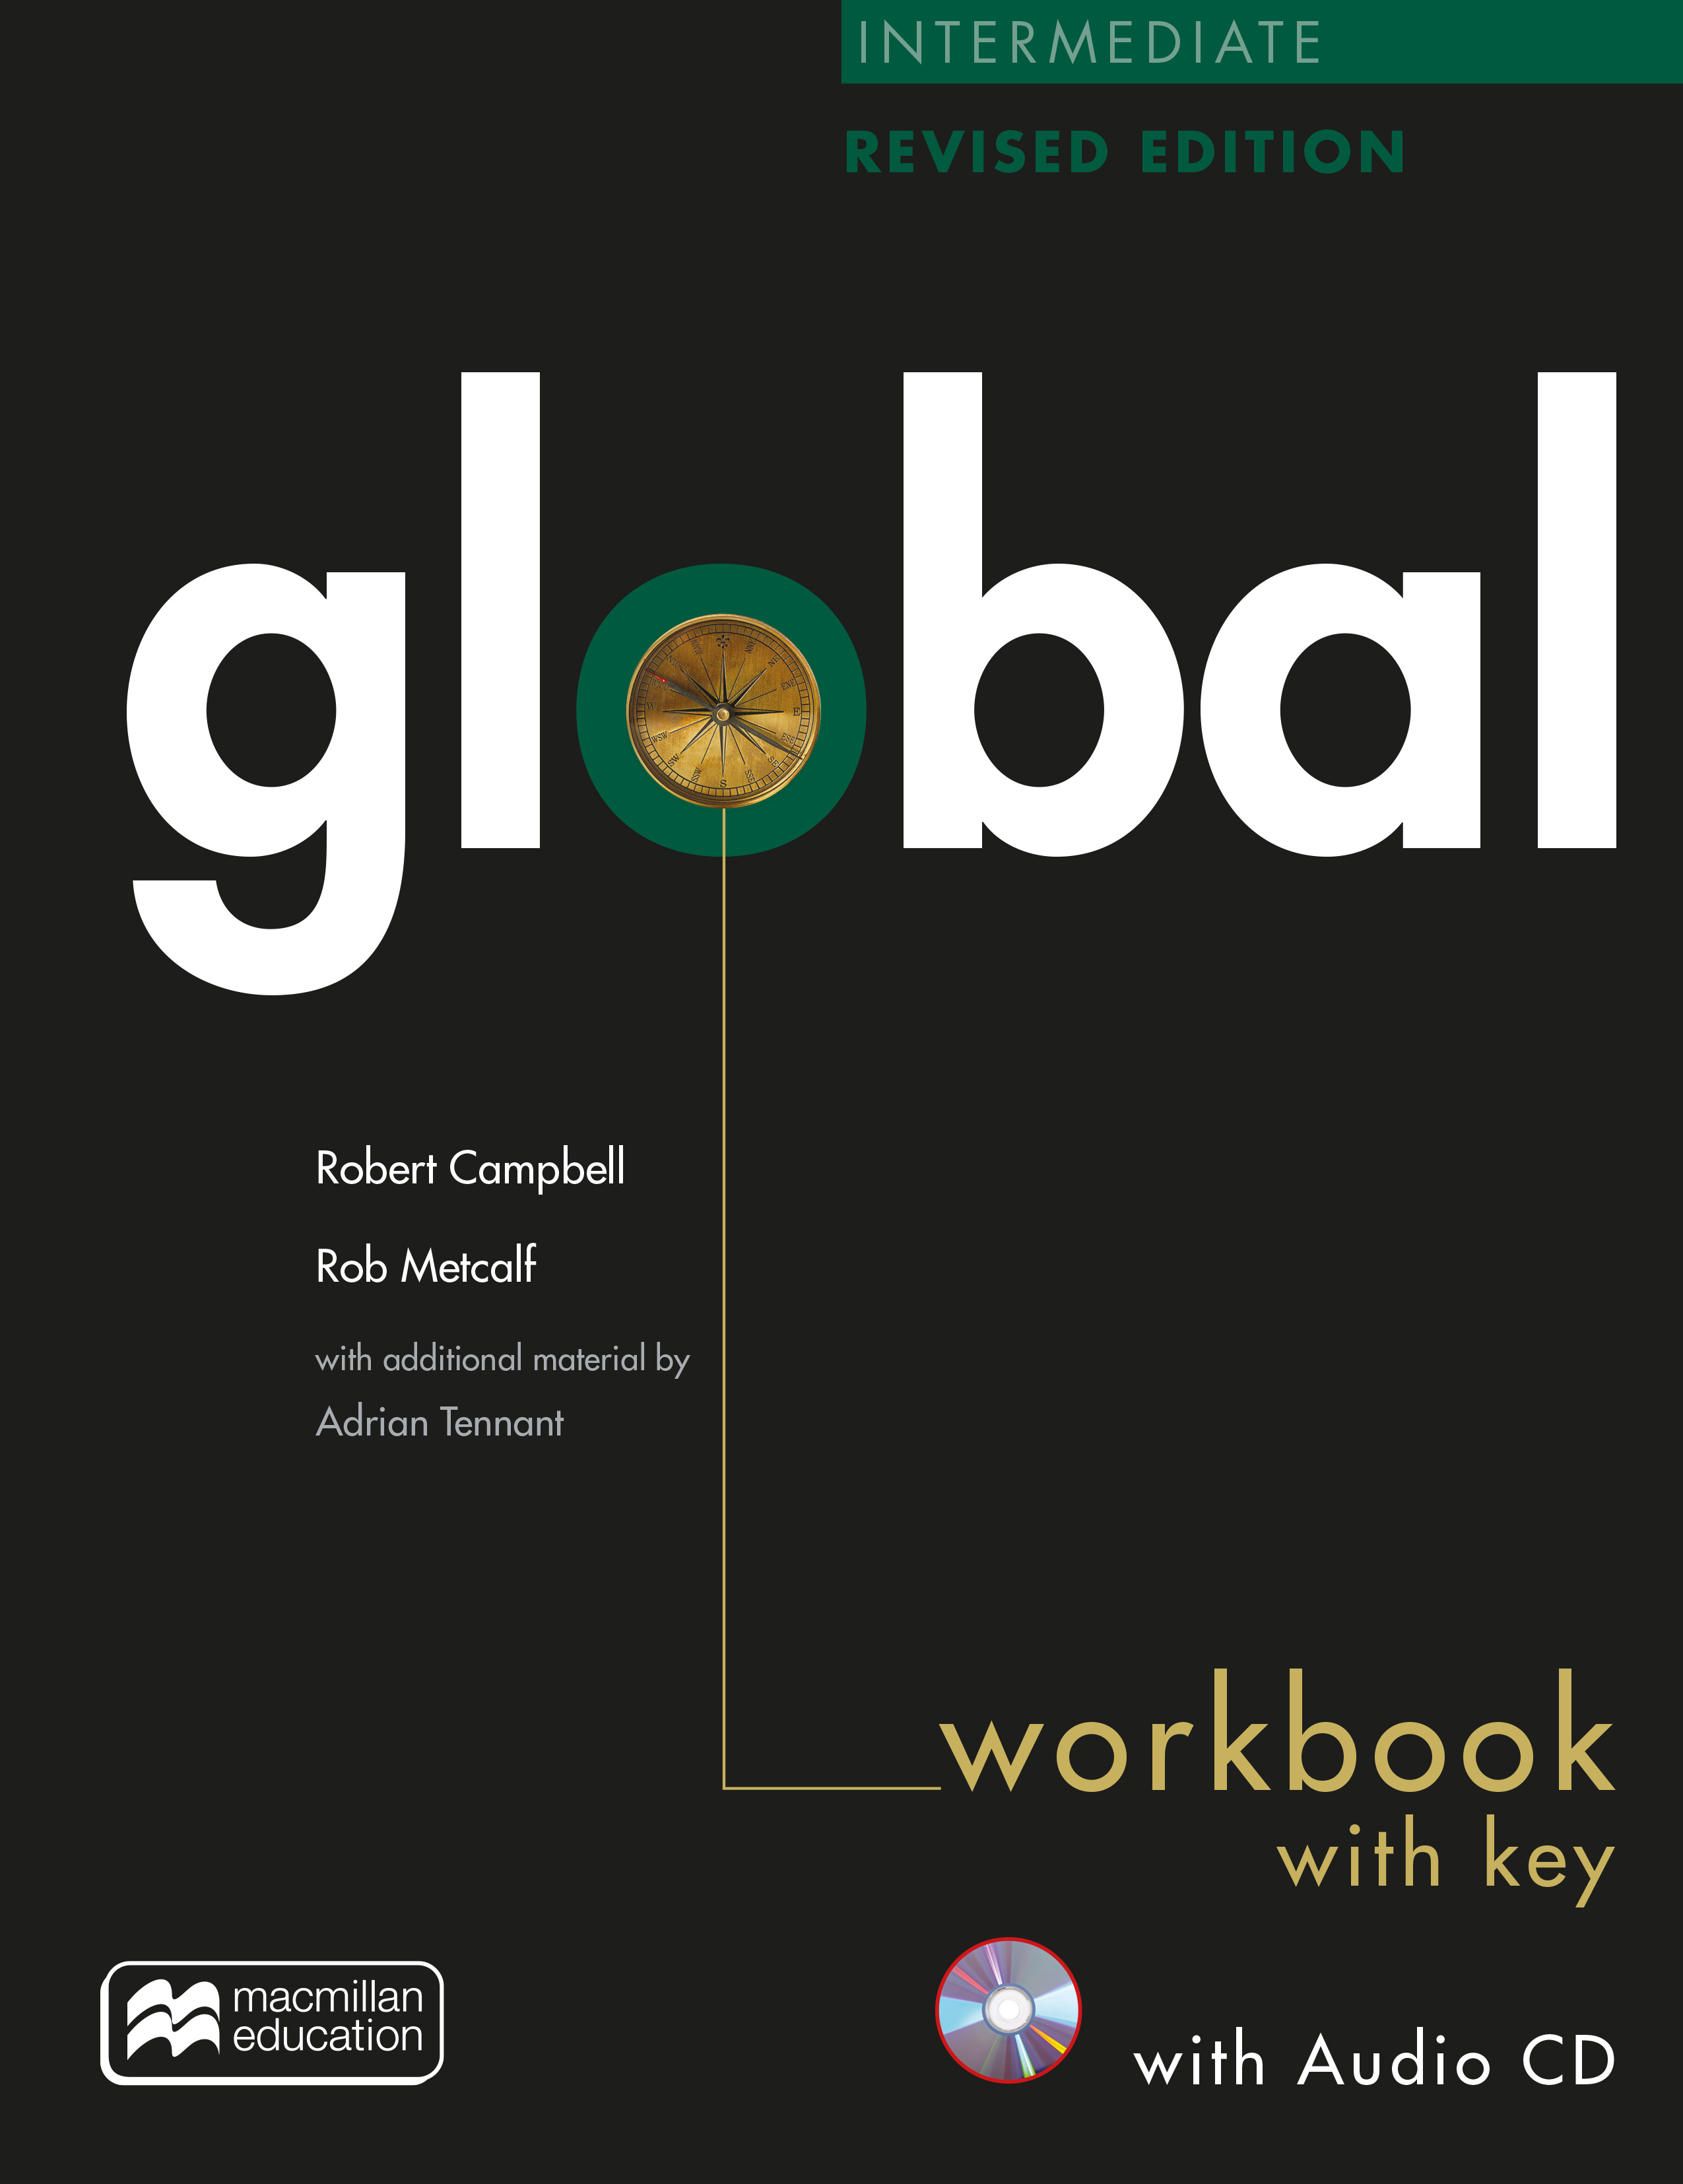 Intermediate Workbook with key + CD pack